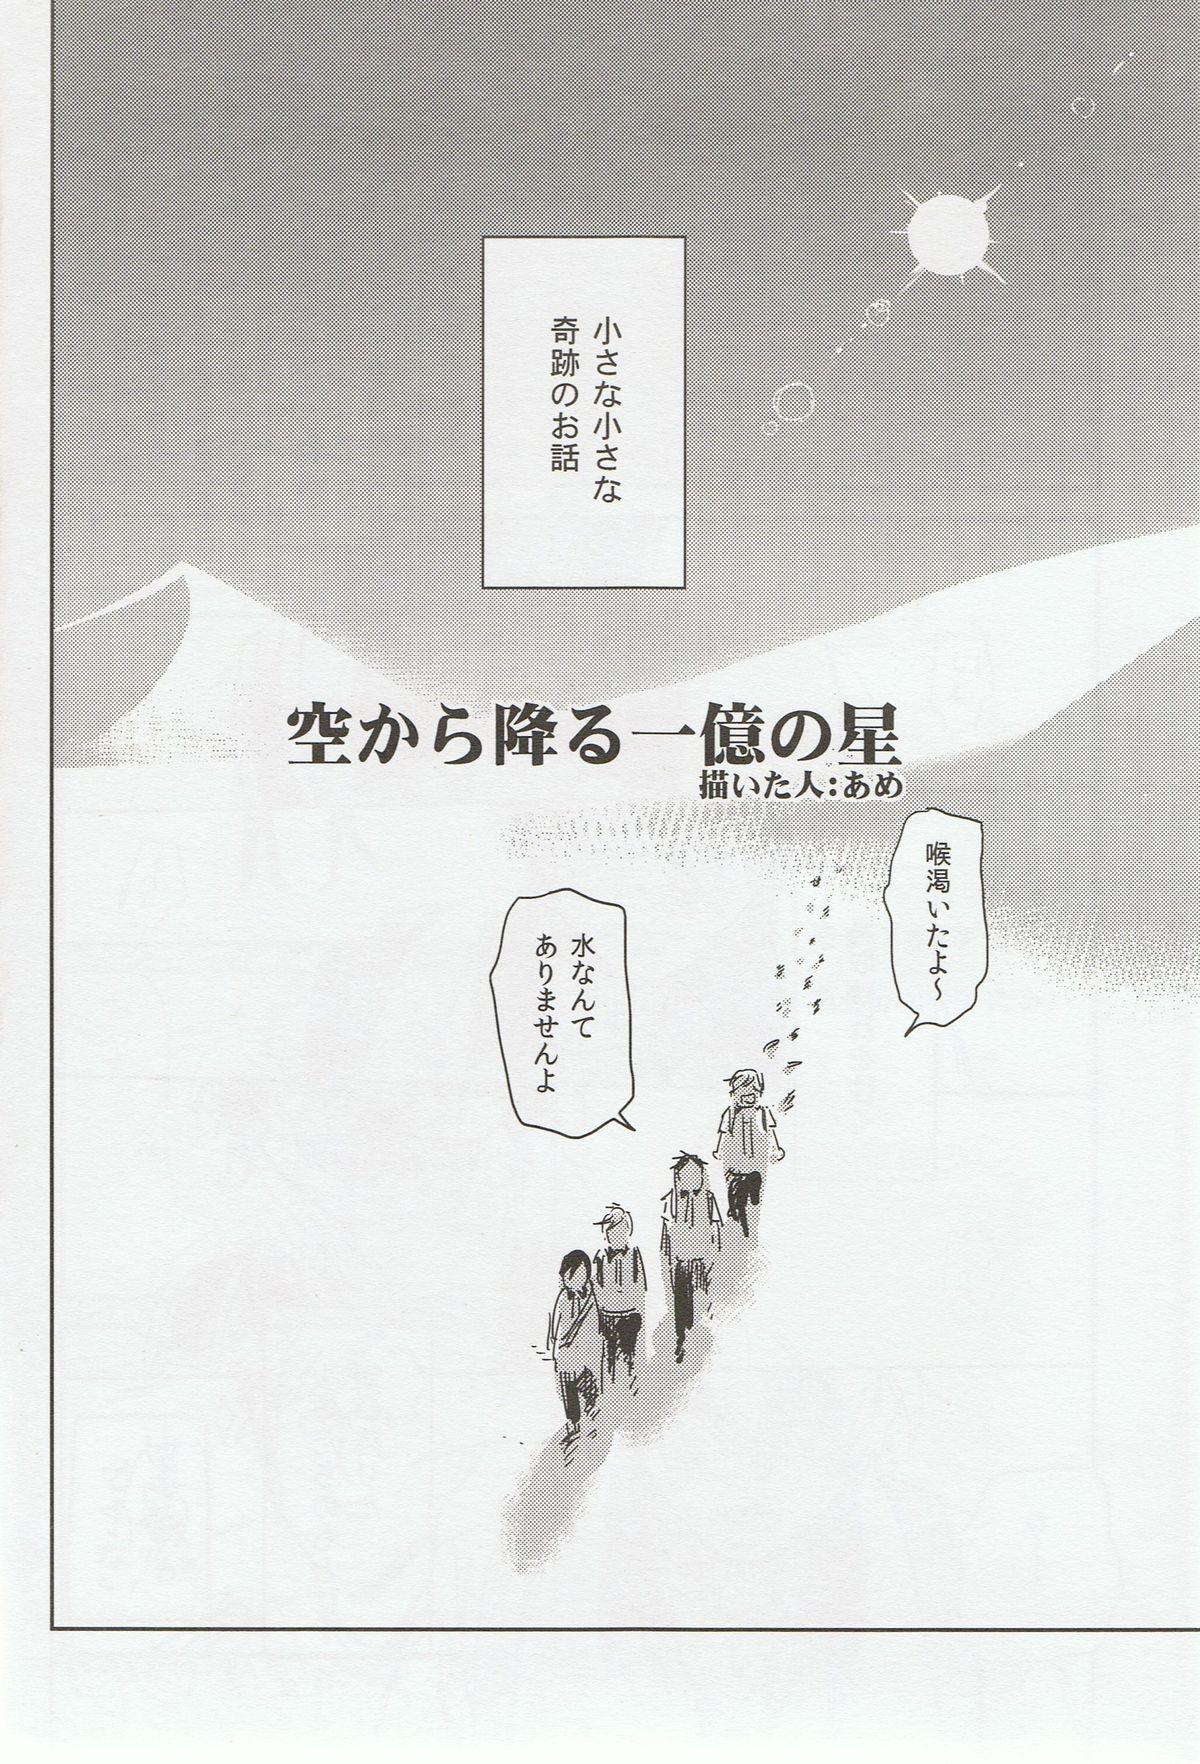 Sou da, Tottori Sakyuu Ikou. 4